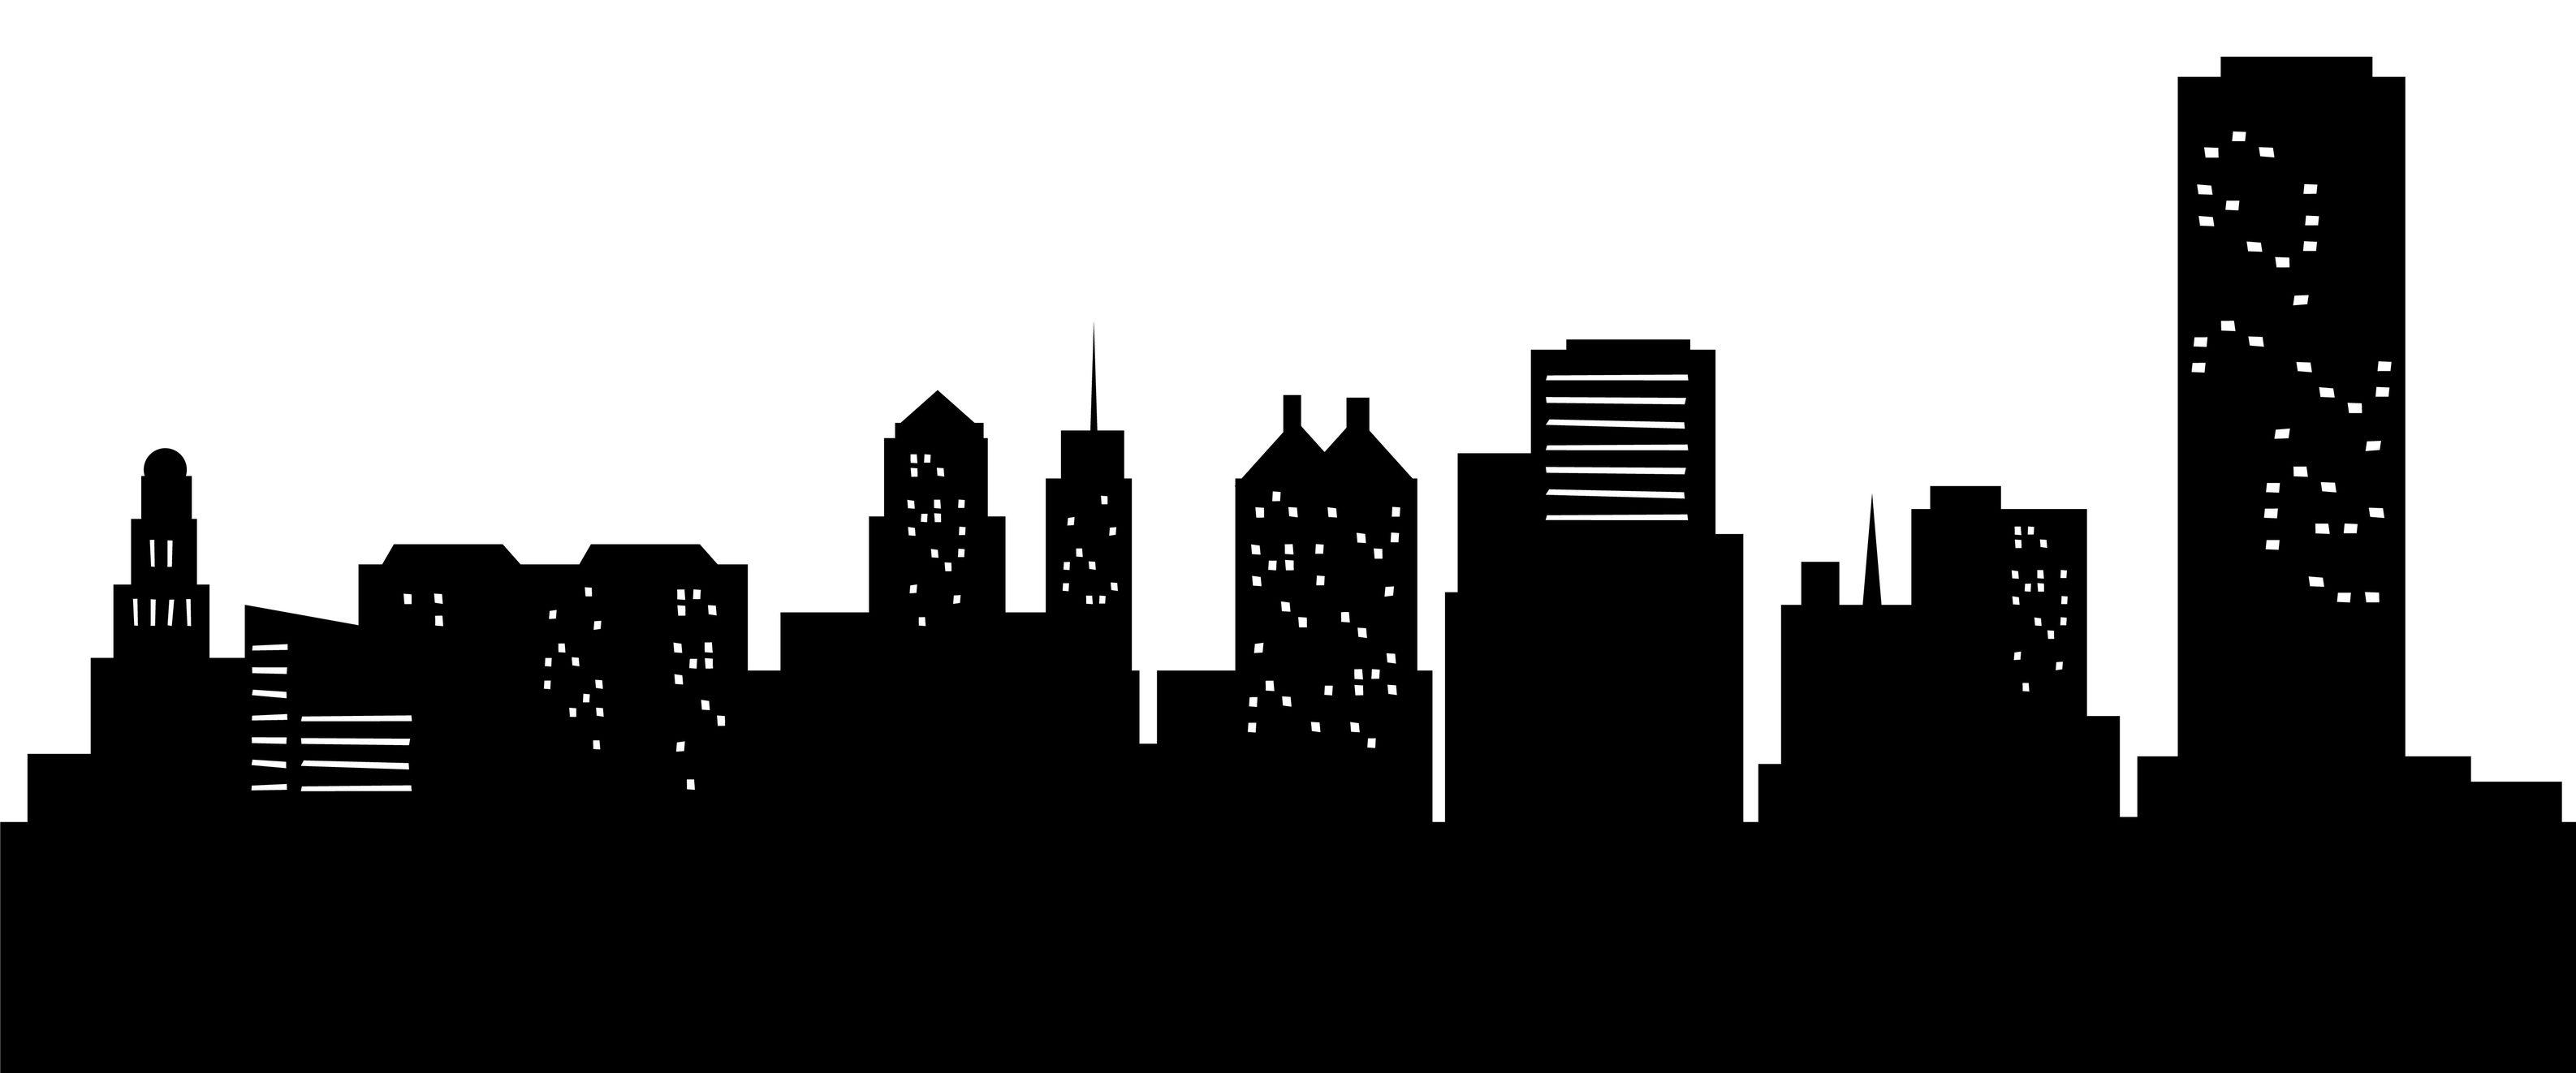 city skyline outline simple - photo #6